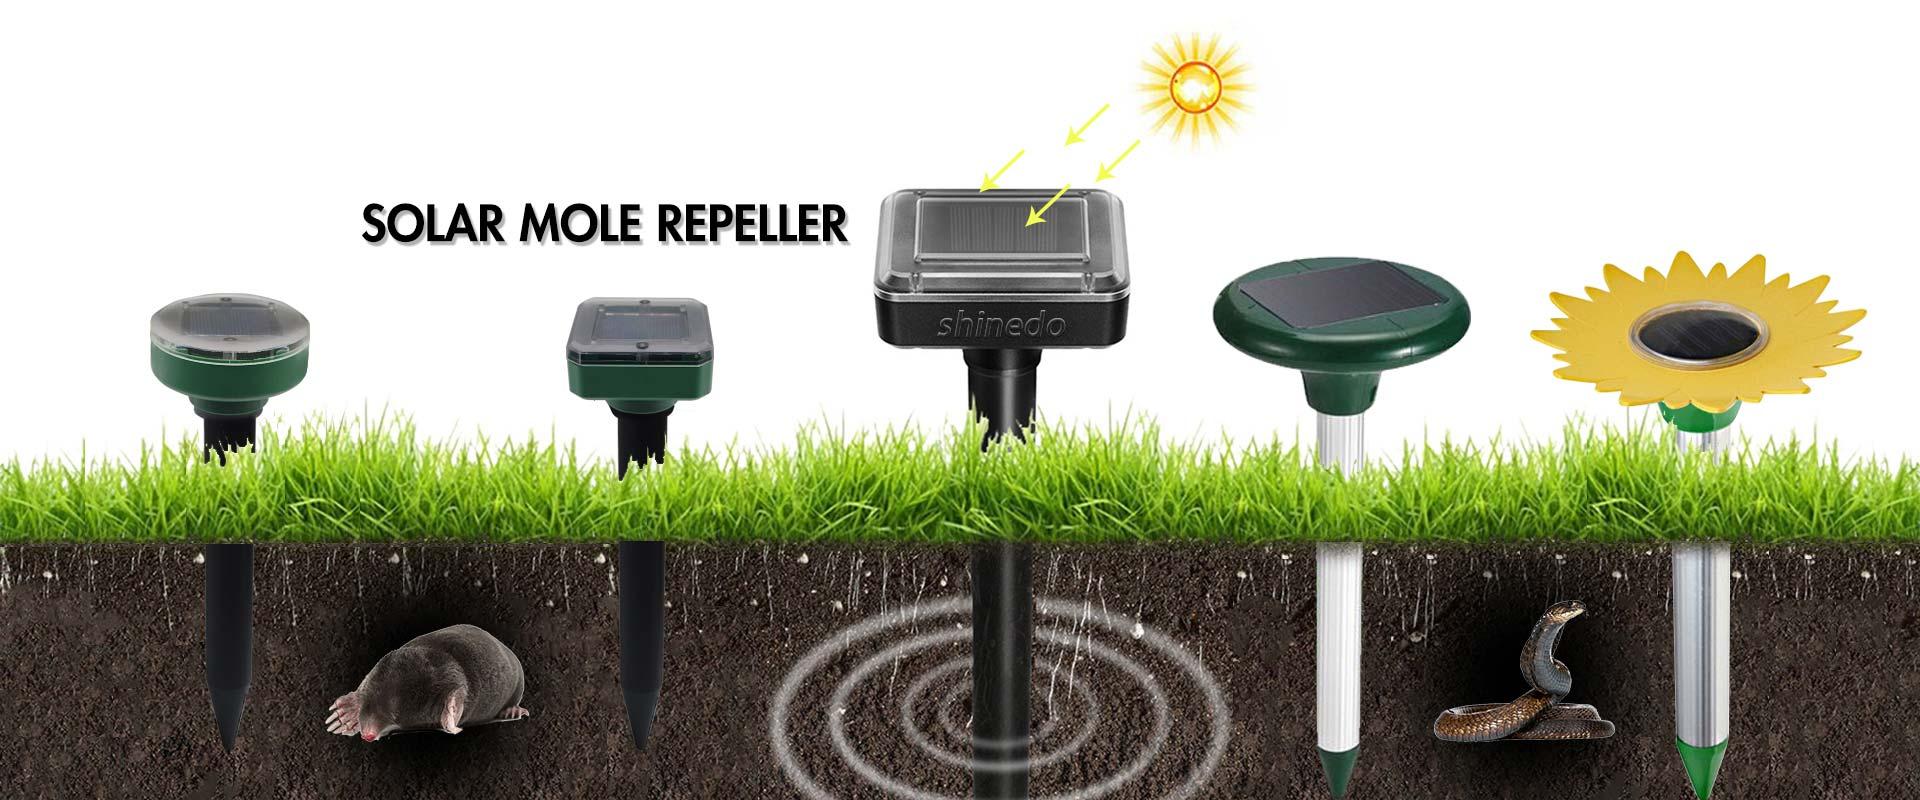 Solar Mole Repeller Supplier China